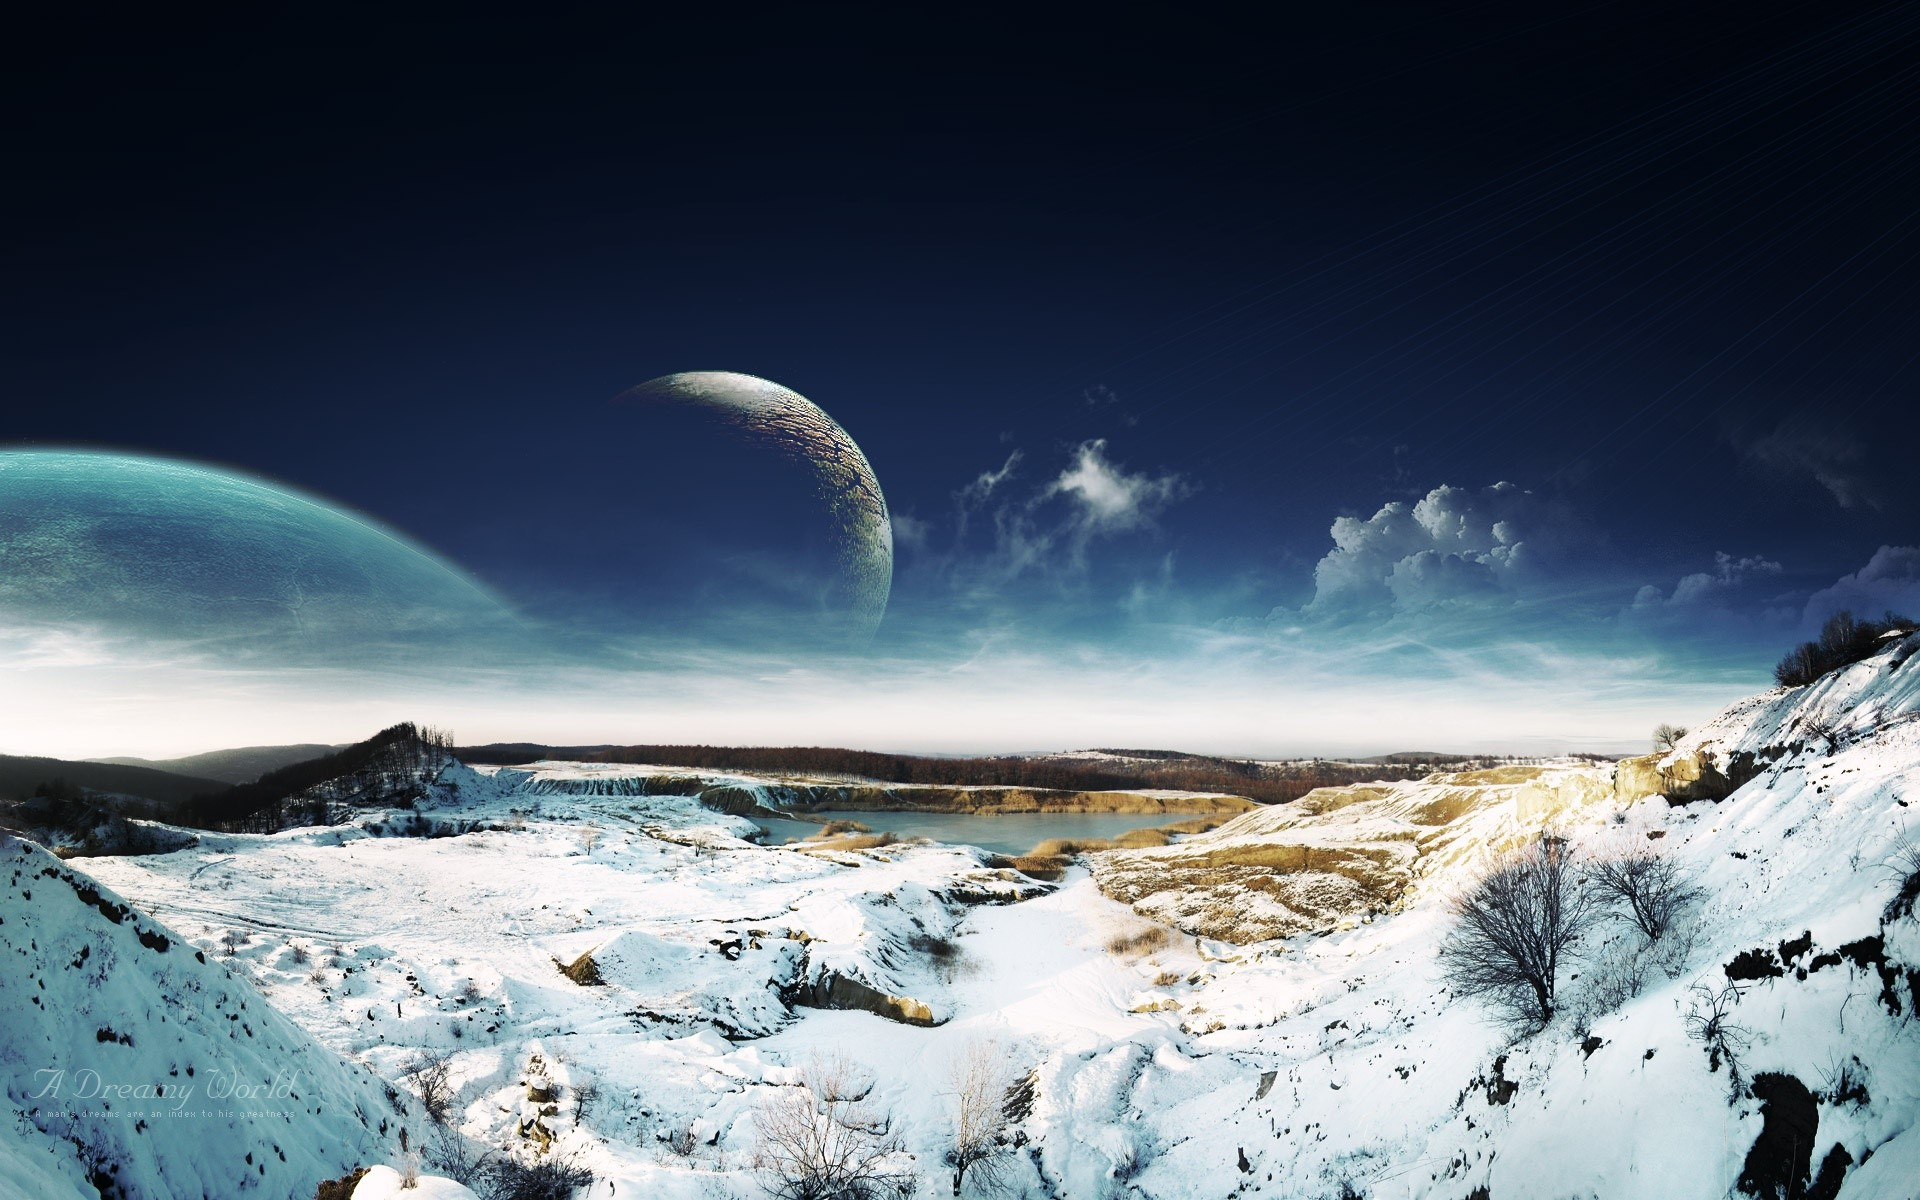 Fondos de pantalla Paisaje nevado de ensueño